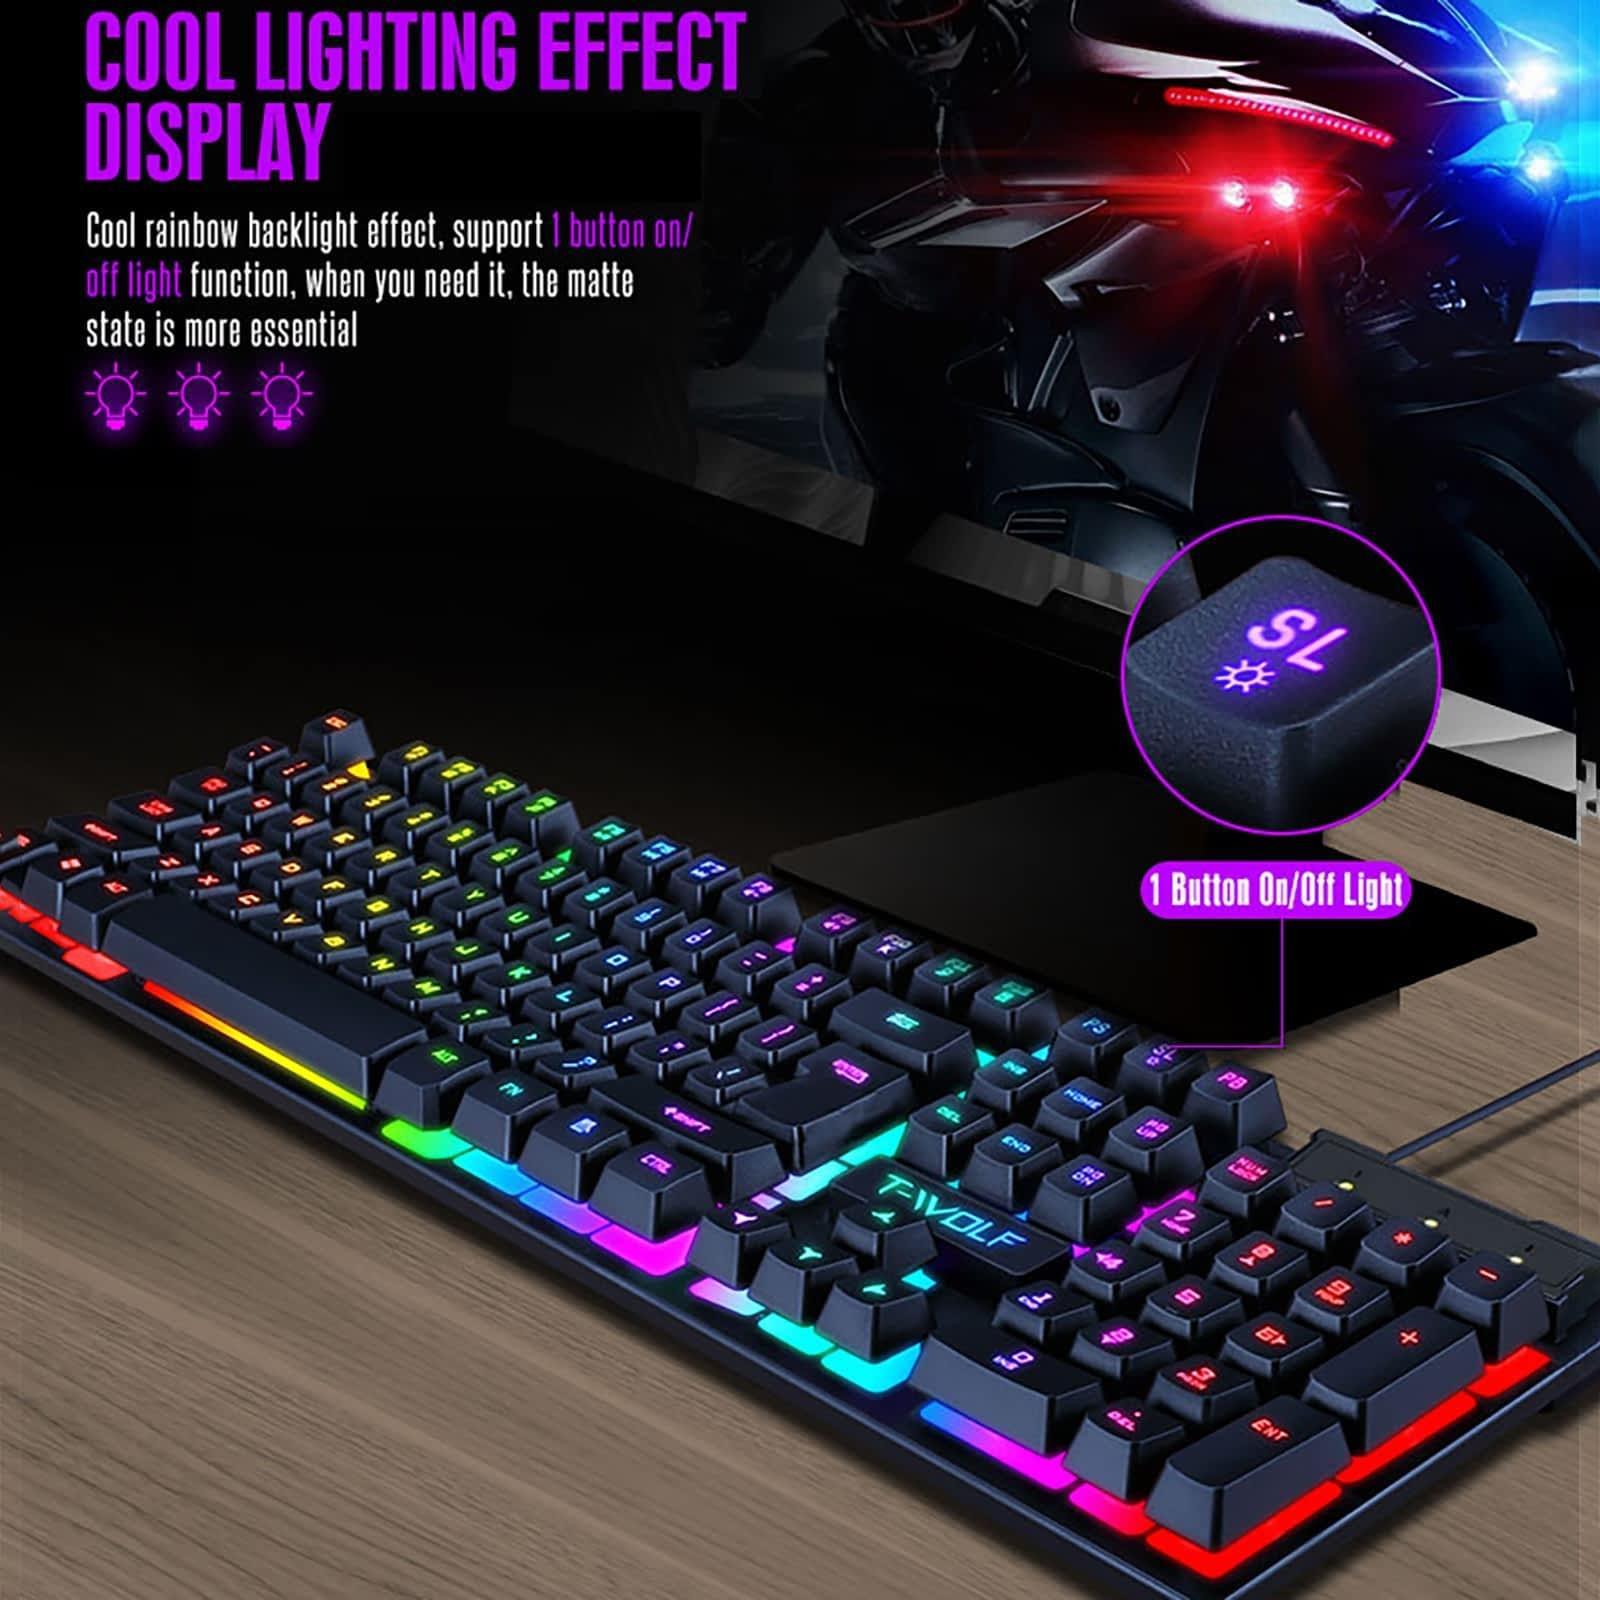 Mechanical-Keyboard-2020-TF200-Rainbow-Backlight-Usb-Ergonomic-Gaming-Keyboard-for-PC-Laptop-Anti-ghosting-Mix.jpg